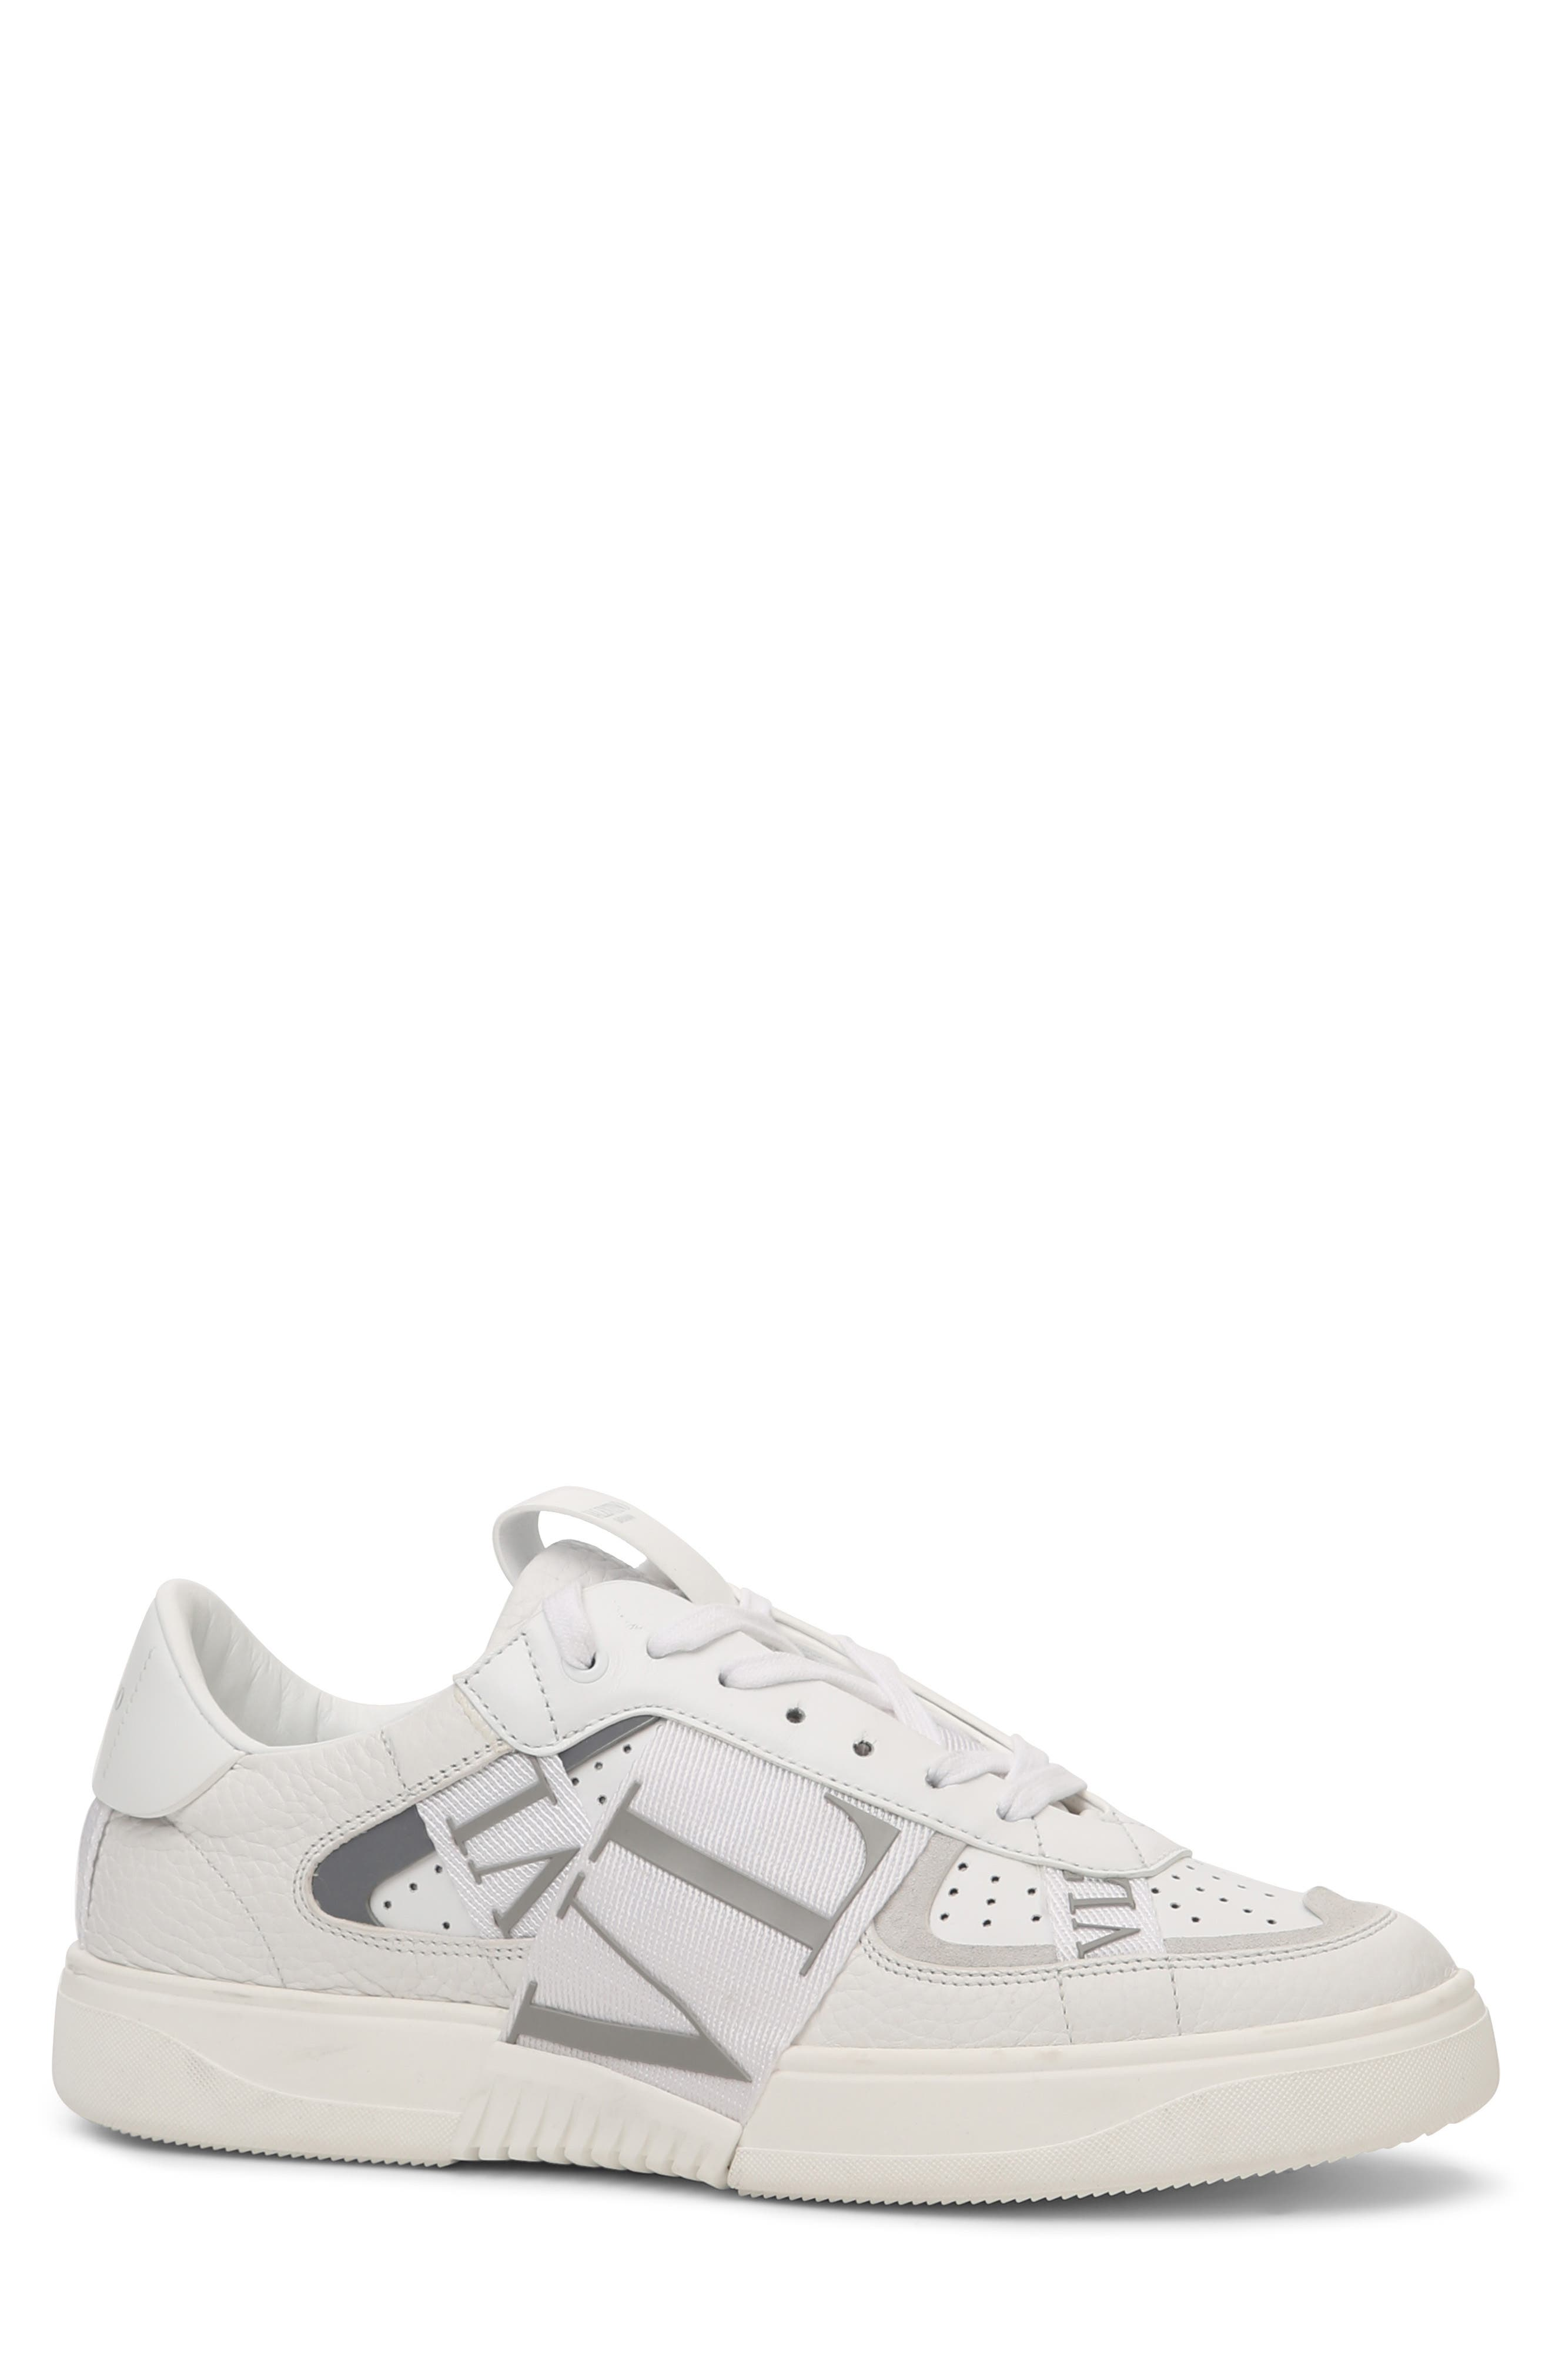 valentino garavani shoes man